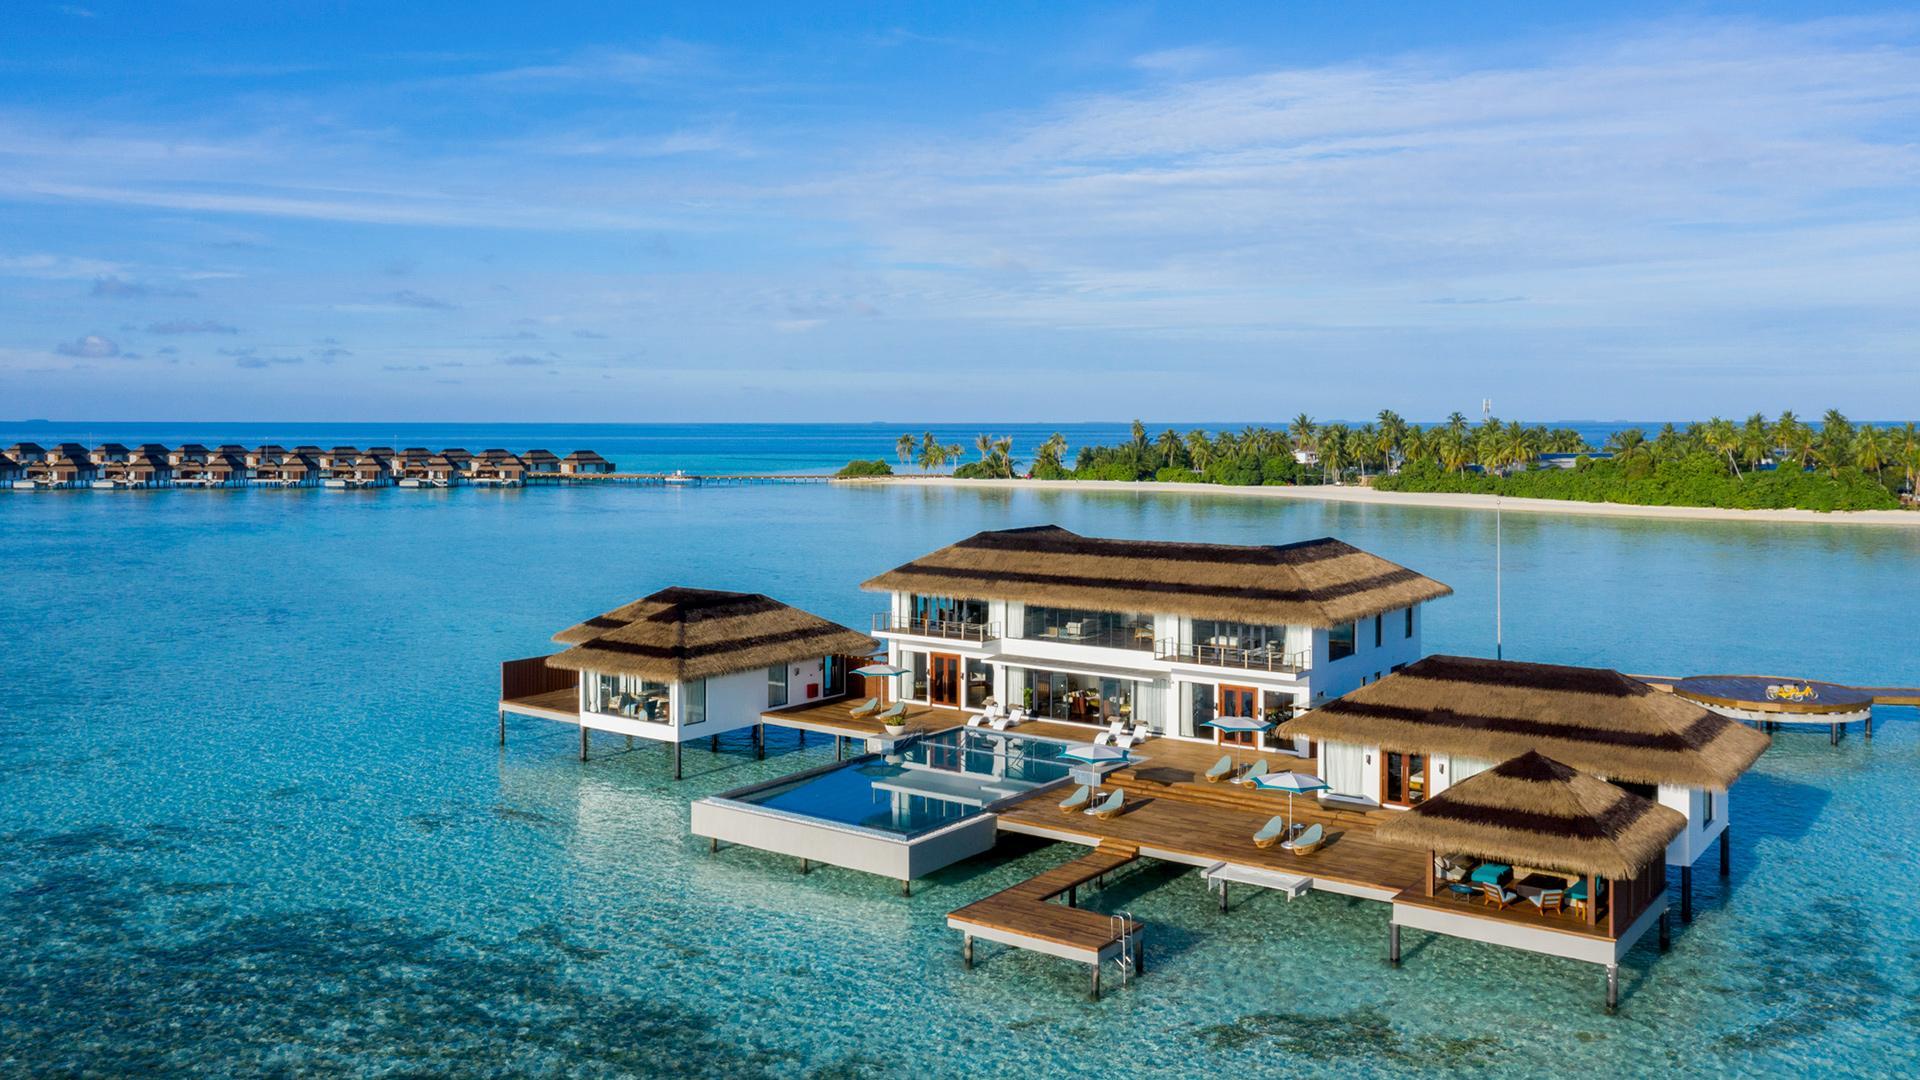 Royal Suite image 1 at Pullman Maldives Maamutaa Resort by null, Upper South Province, Maldives